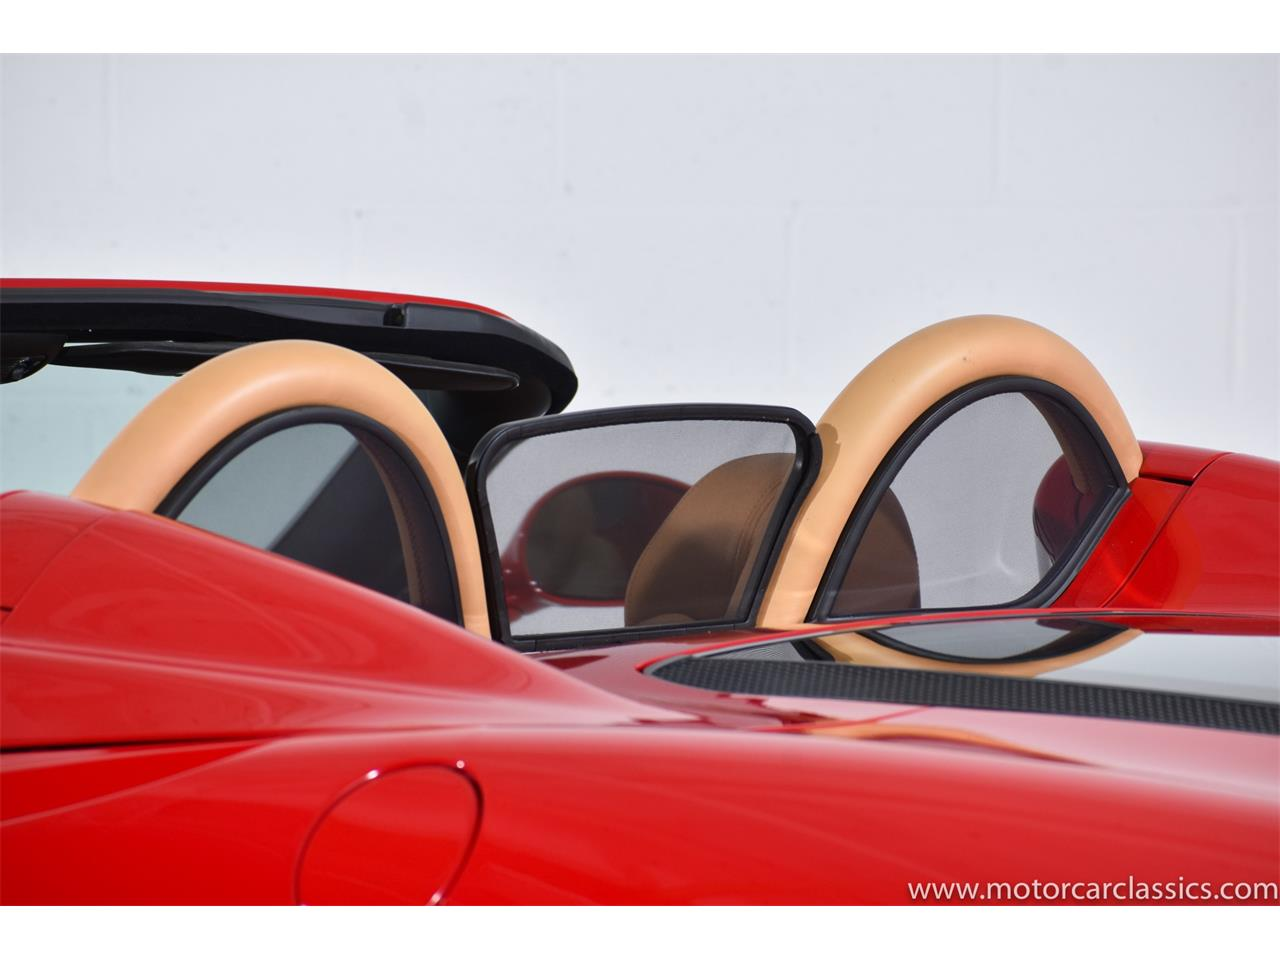 2004 Ferrari 360 Spider (CC-1253586) for sale in Farmingdale, New York